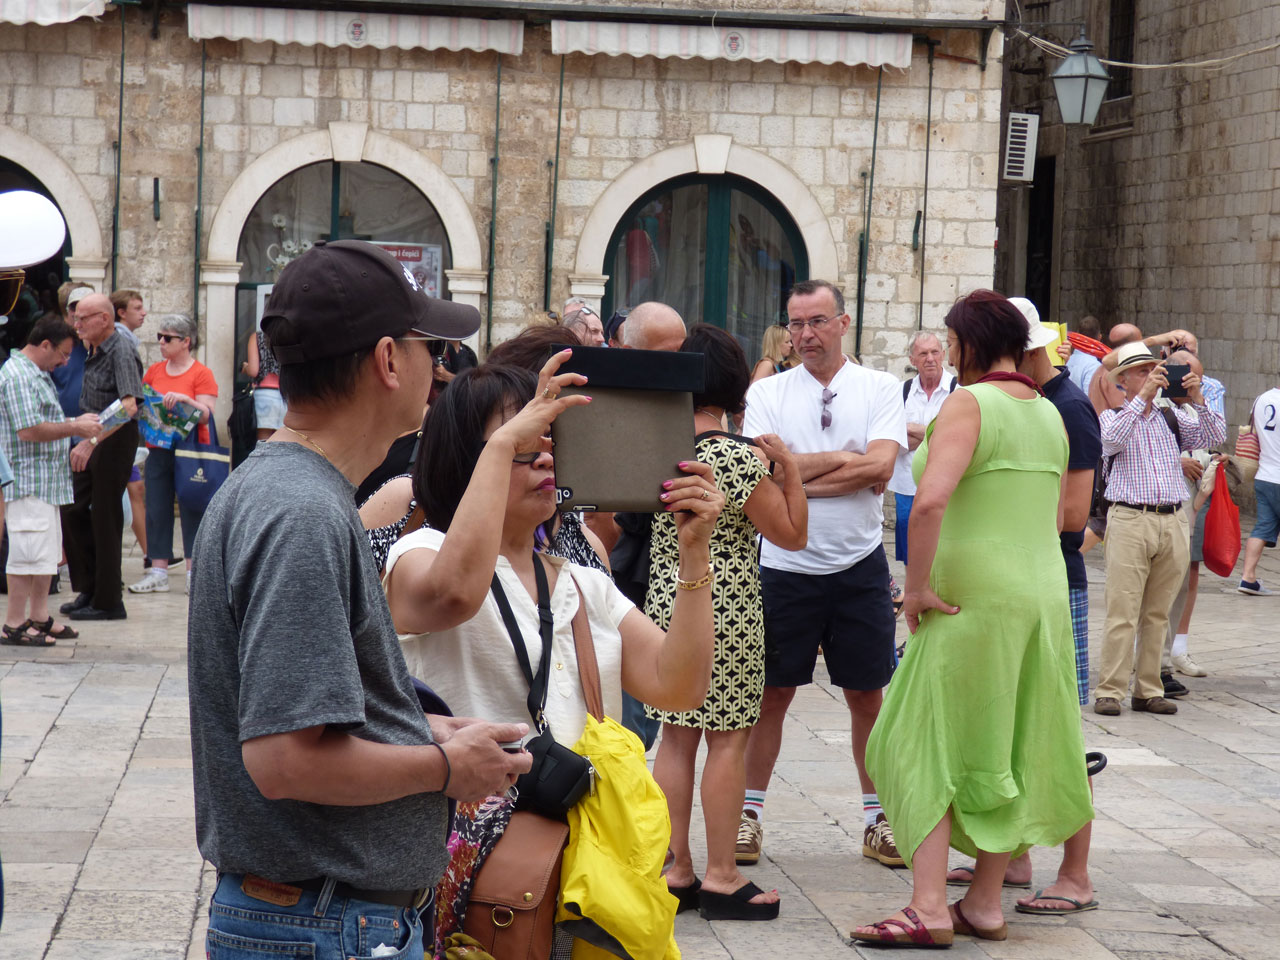 Tourists in Dubrovnik, Croatia